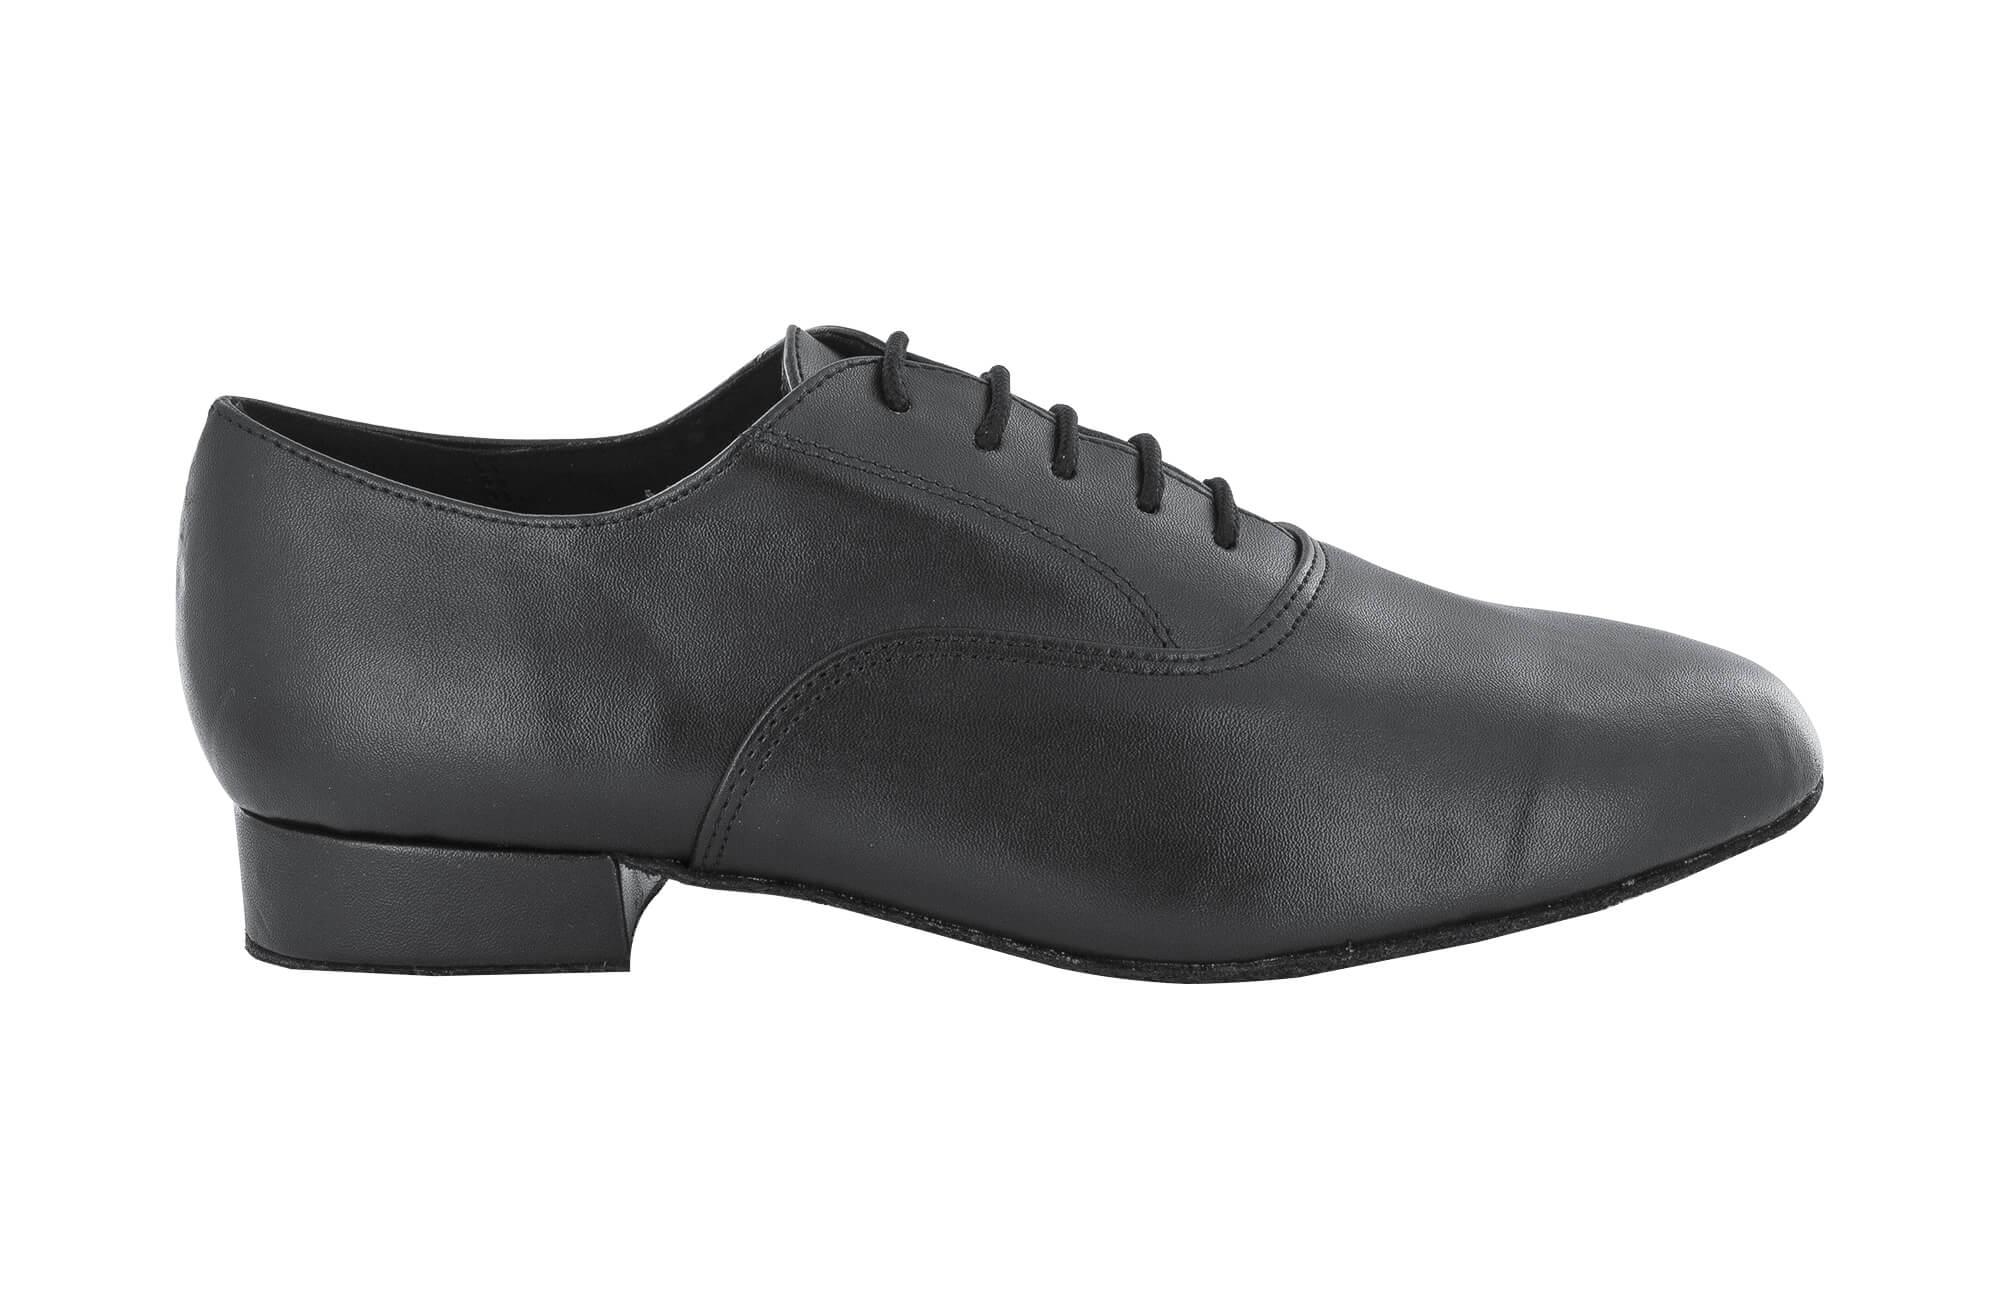 Zapato de baile Danc'in Niño con Tacón de 2'5cm